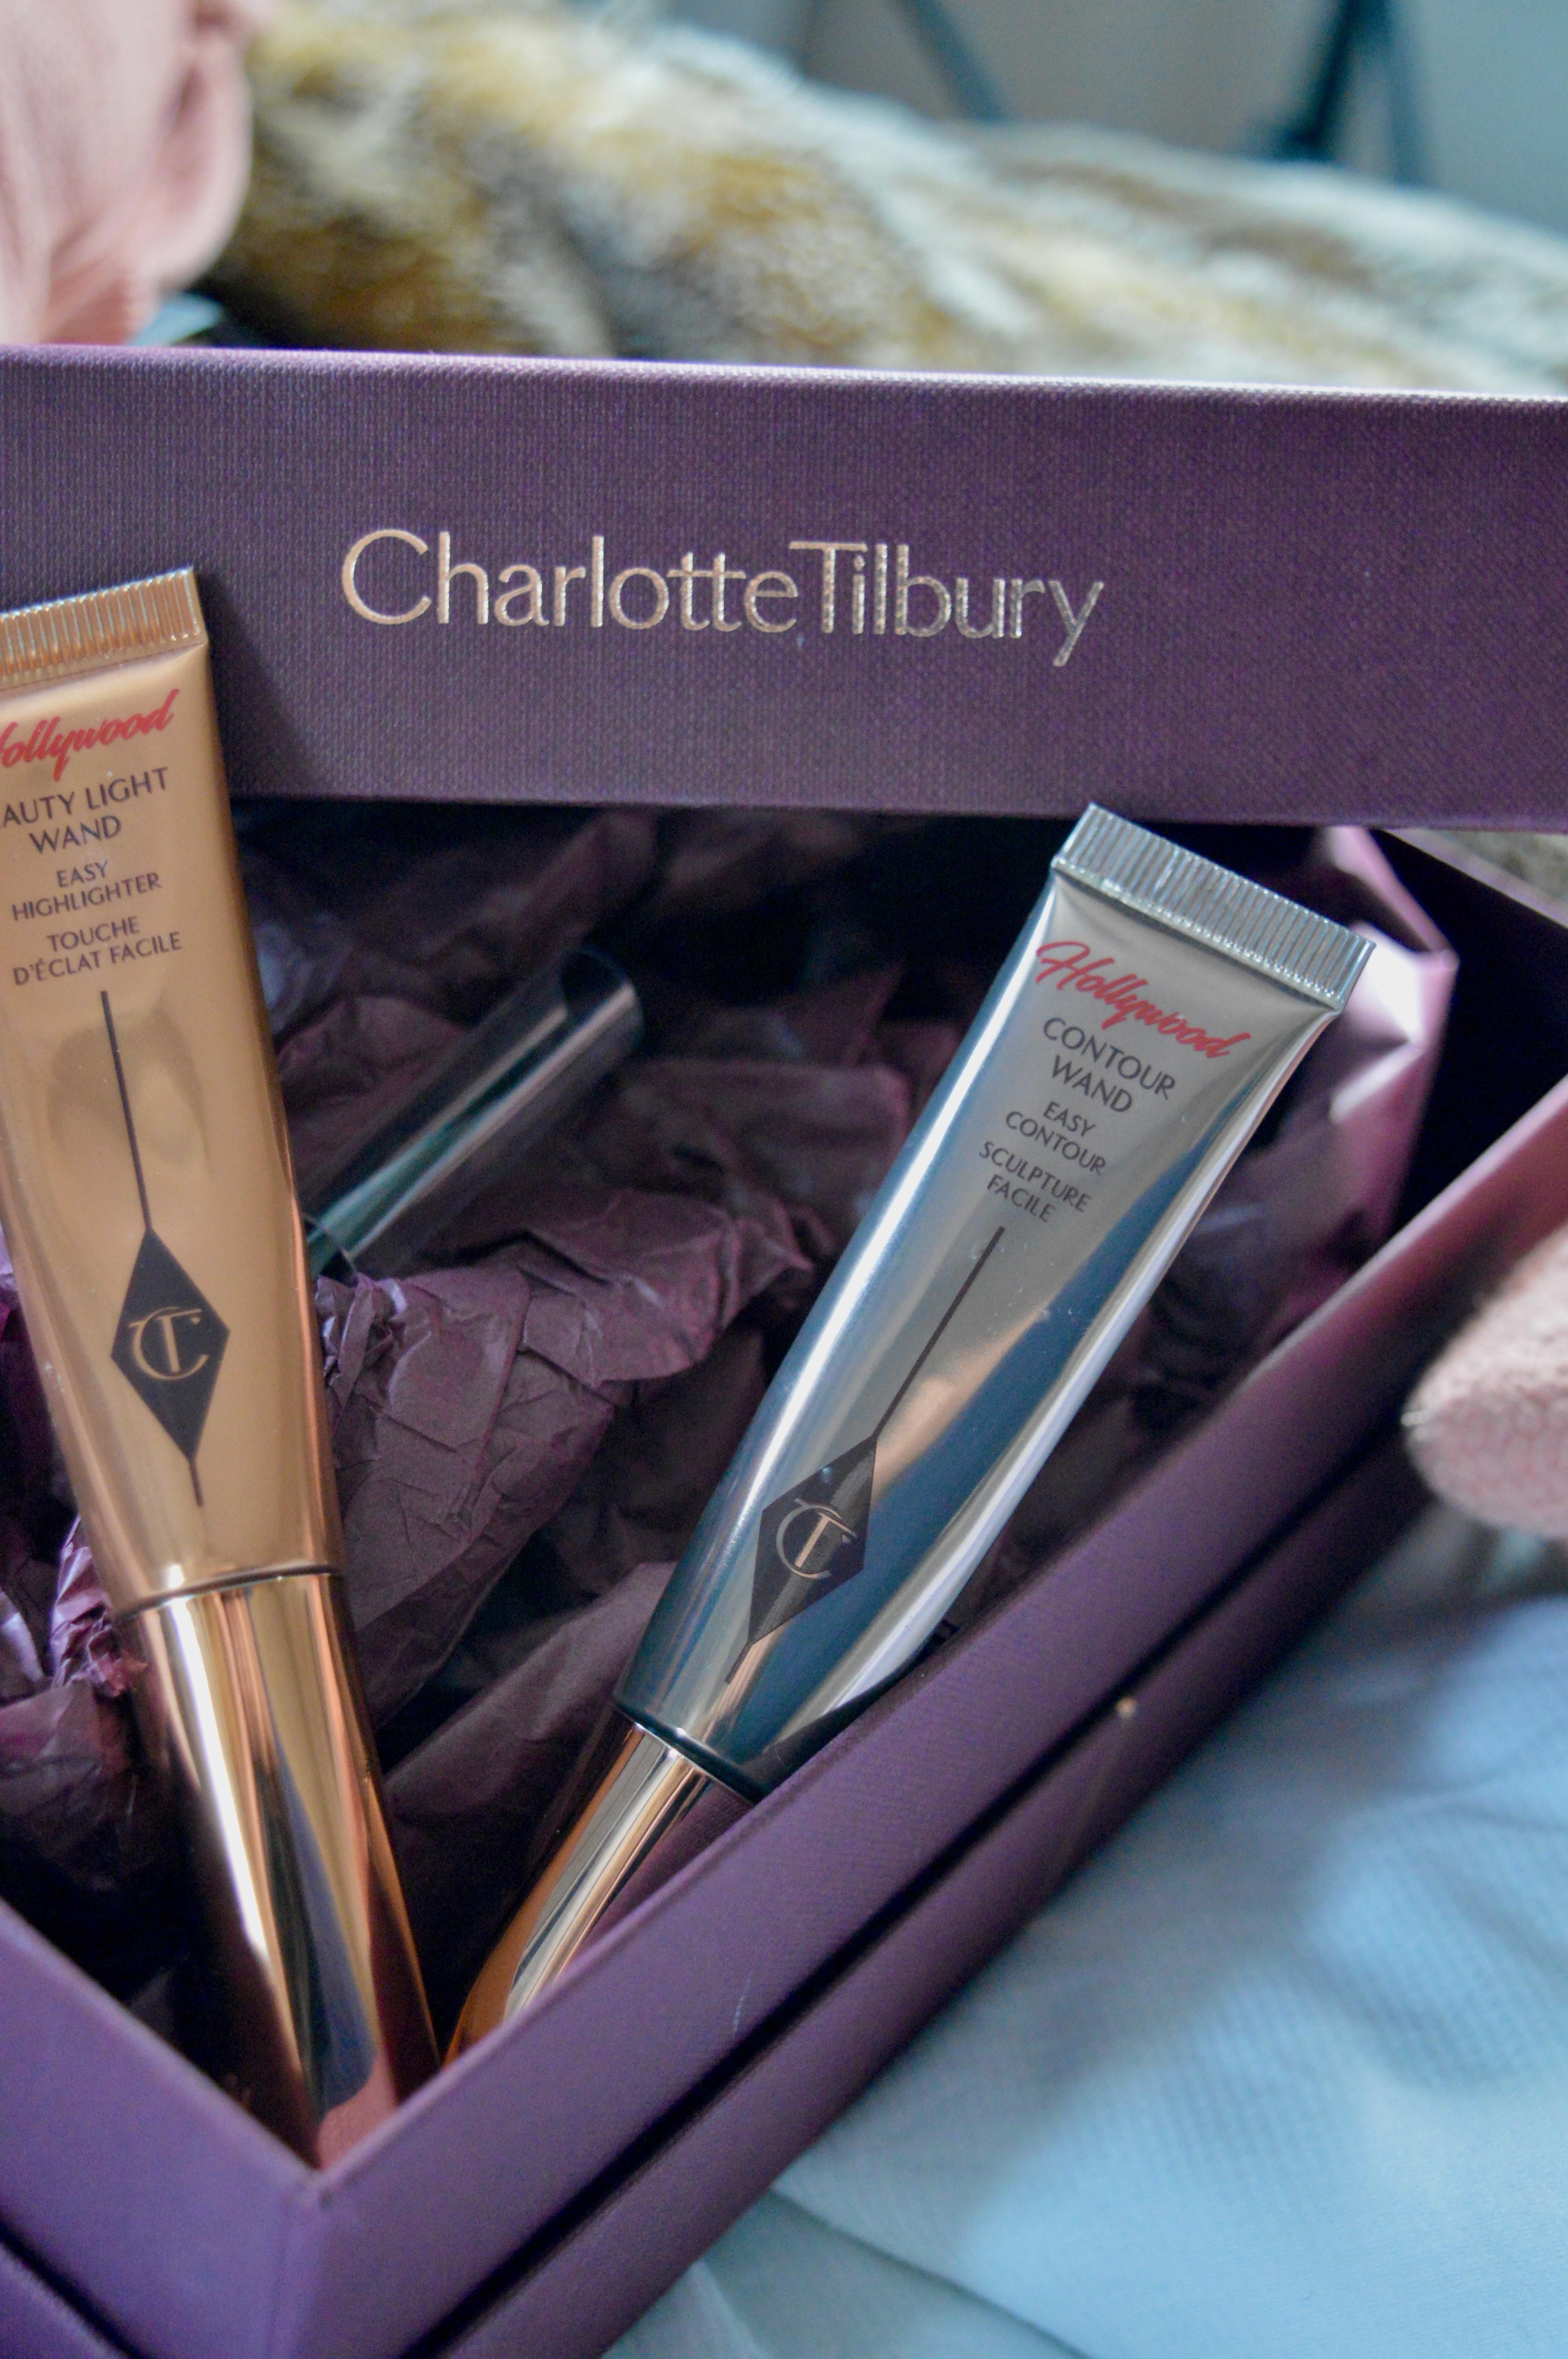 duo-charlotte-tilbury-make-up-hollywood-secrets-elle-blonde-luxury-lifestyle-destination-blog